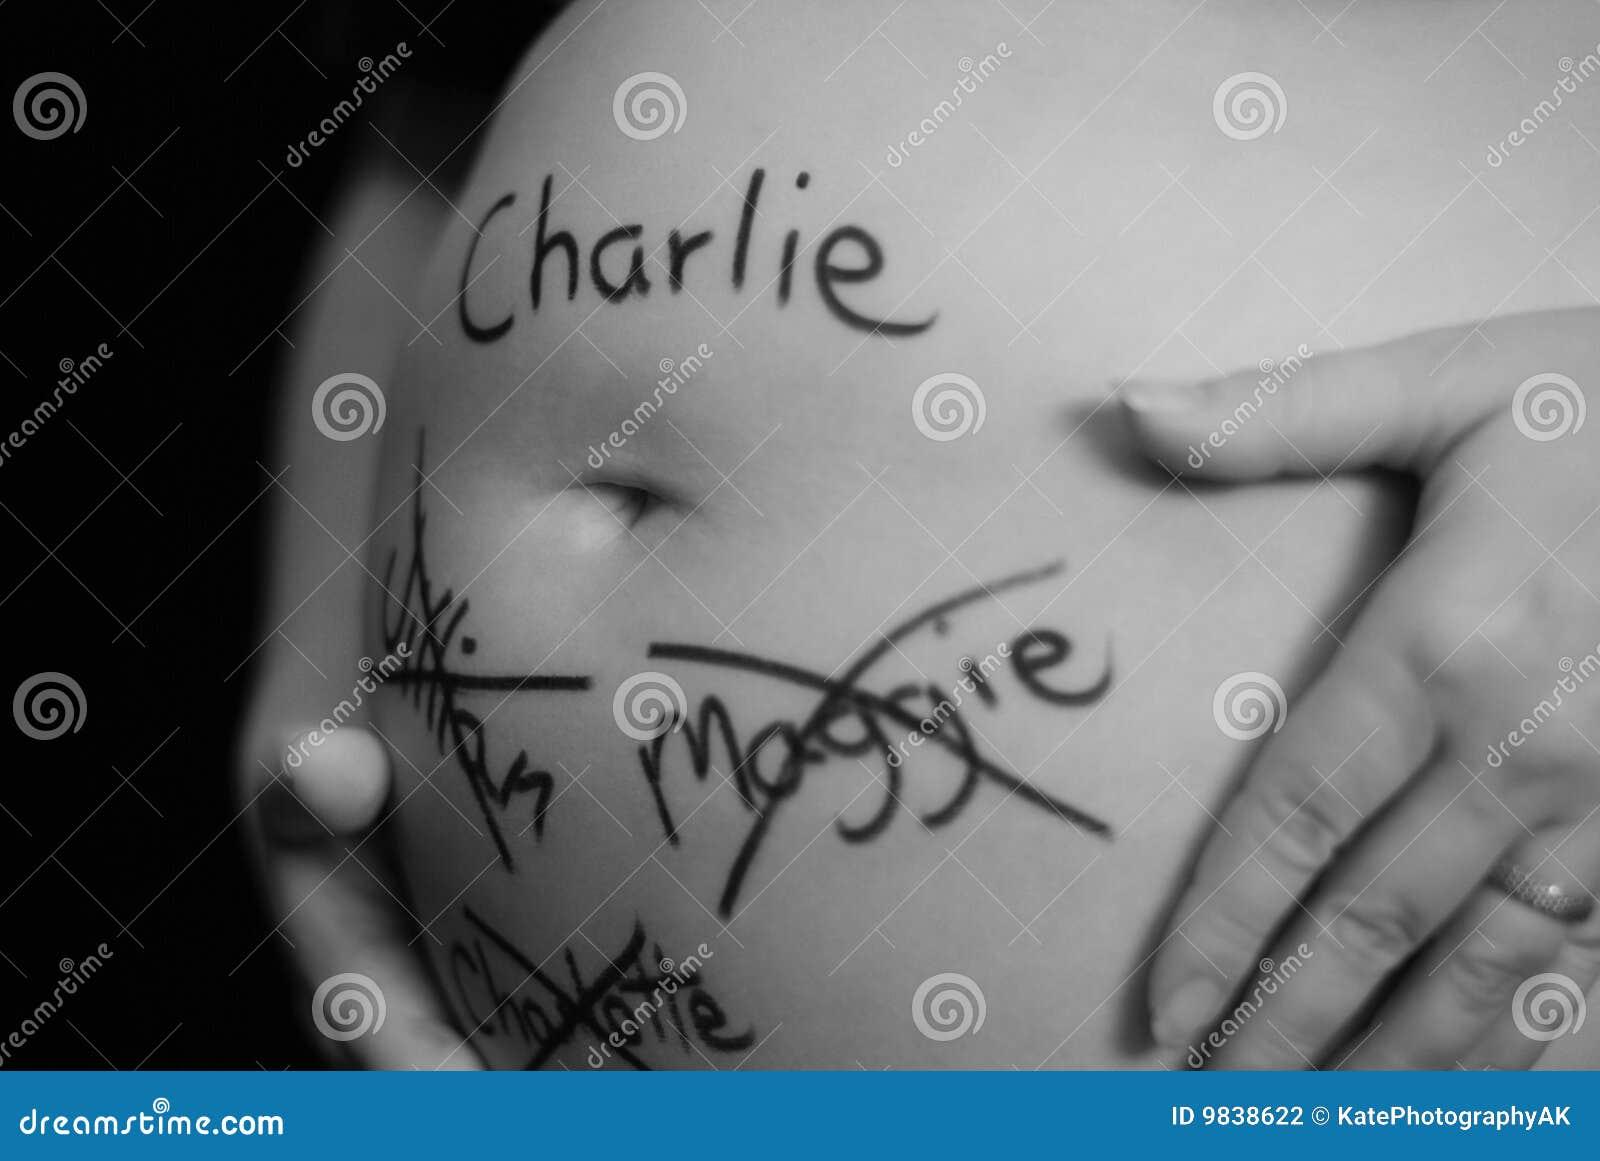 a girl named charlie stock photo image of female chosen 9838622